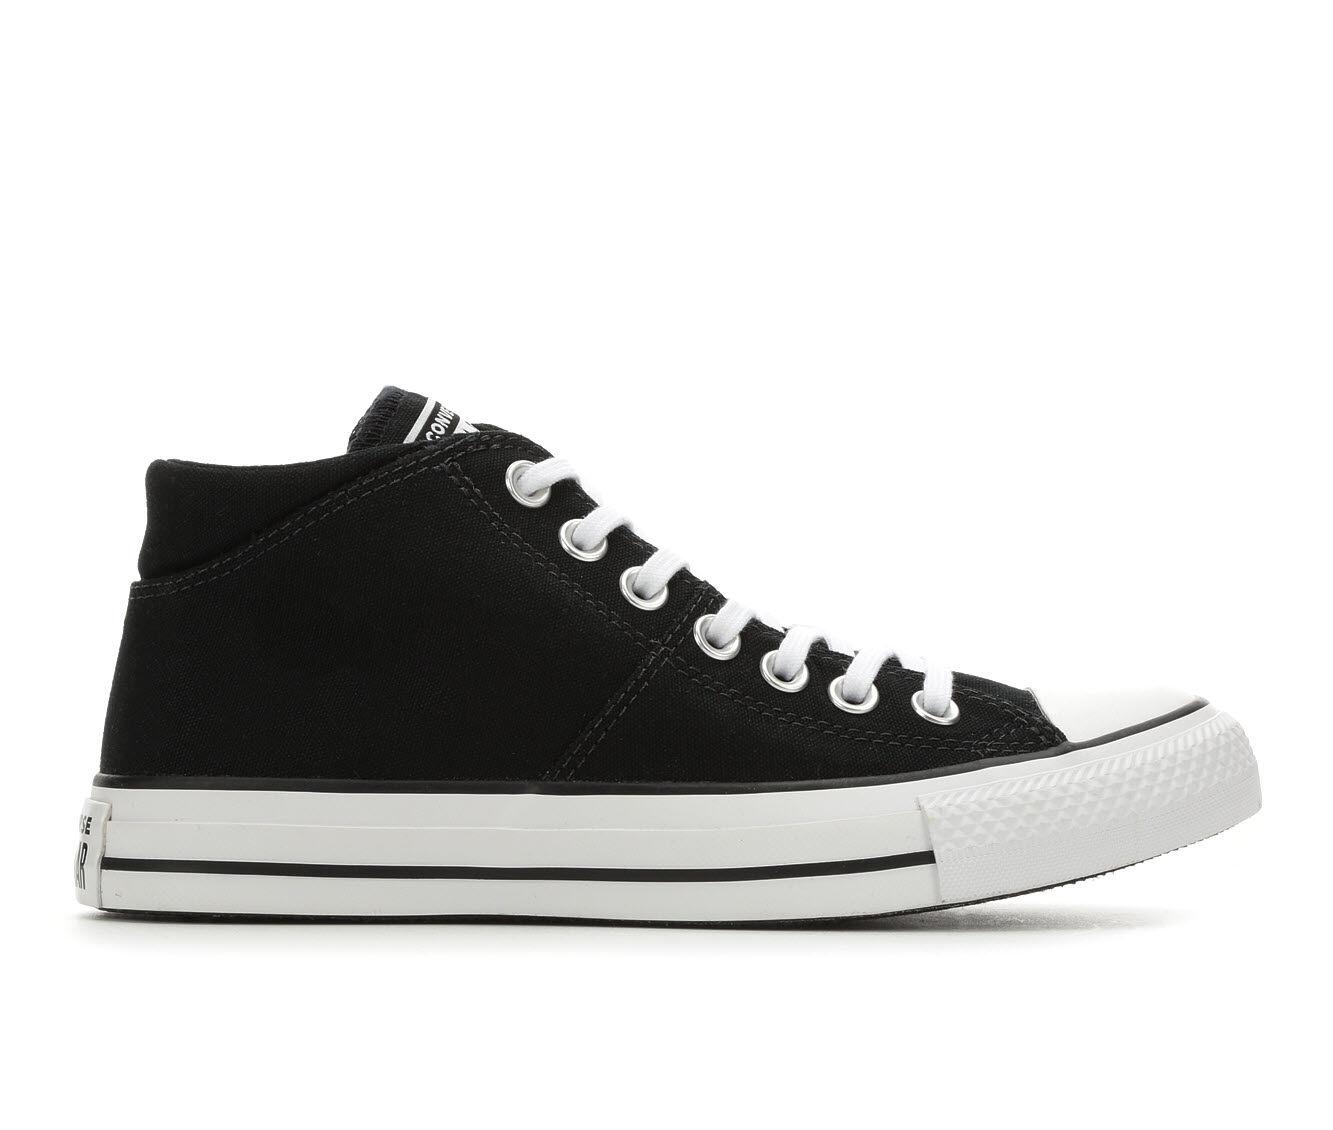 uk shoes_kd4352